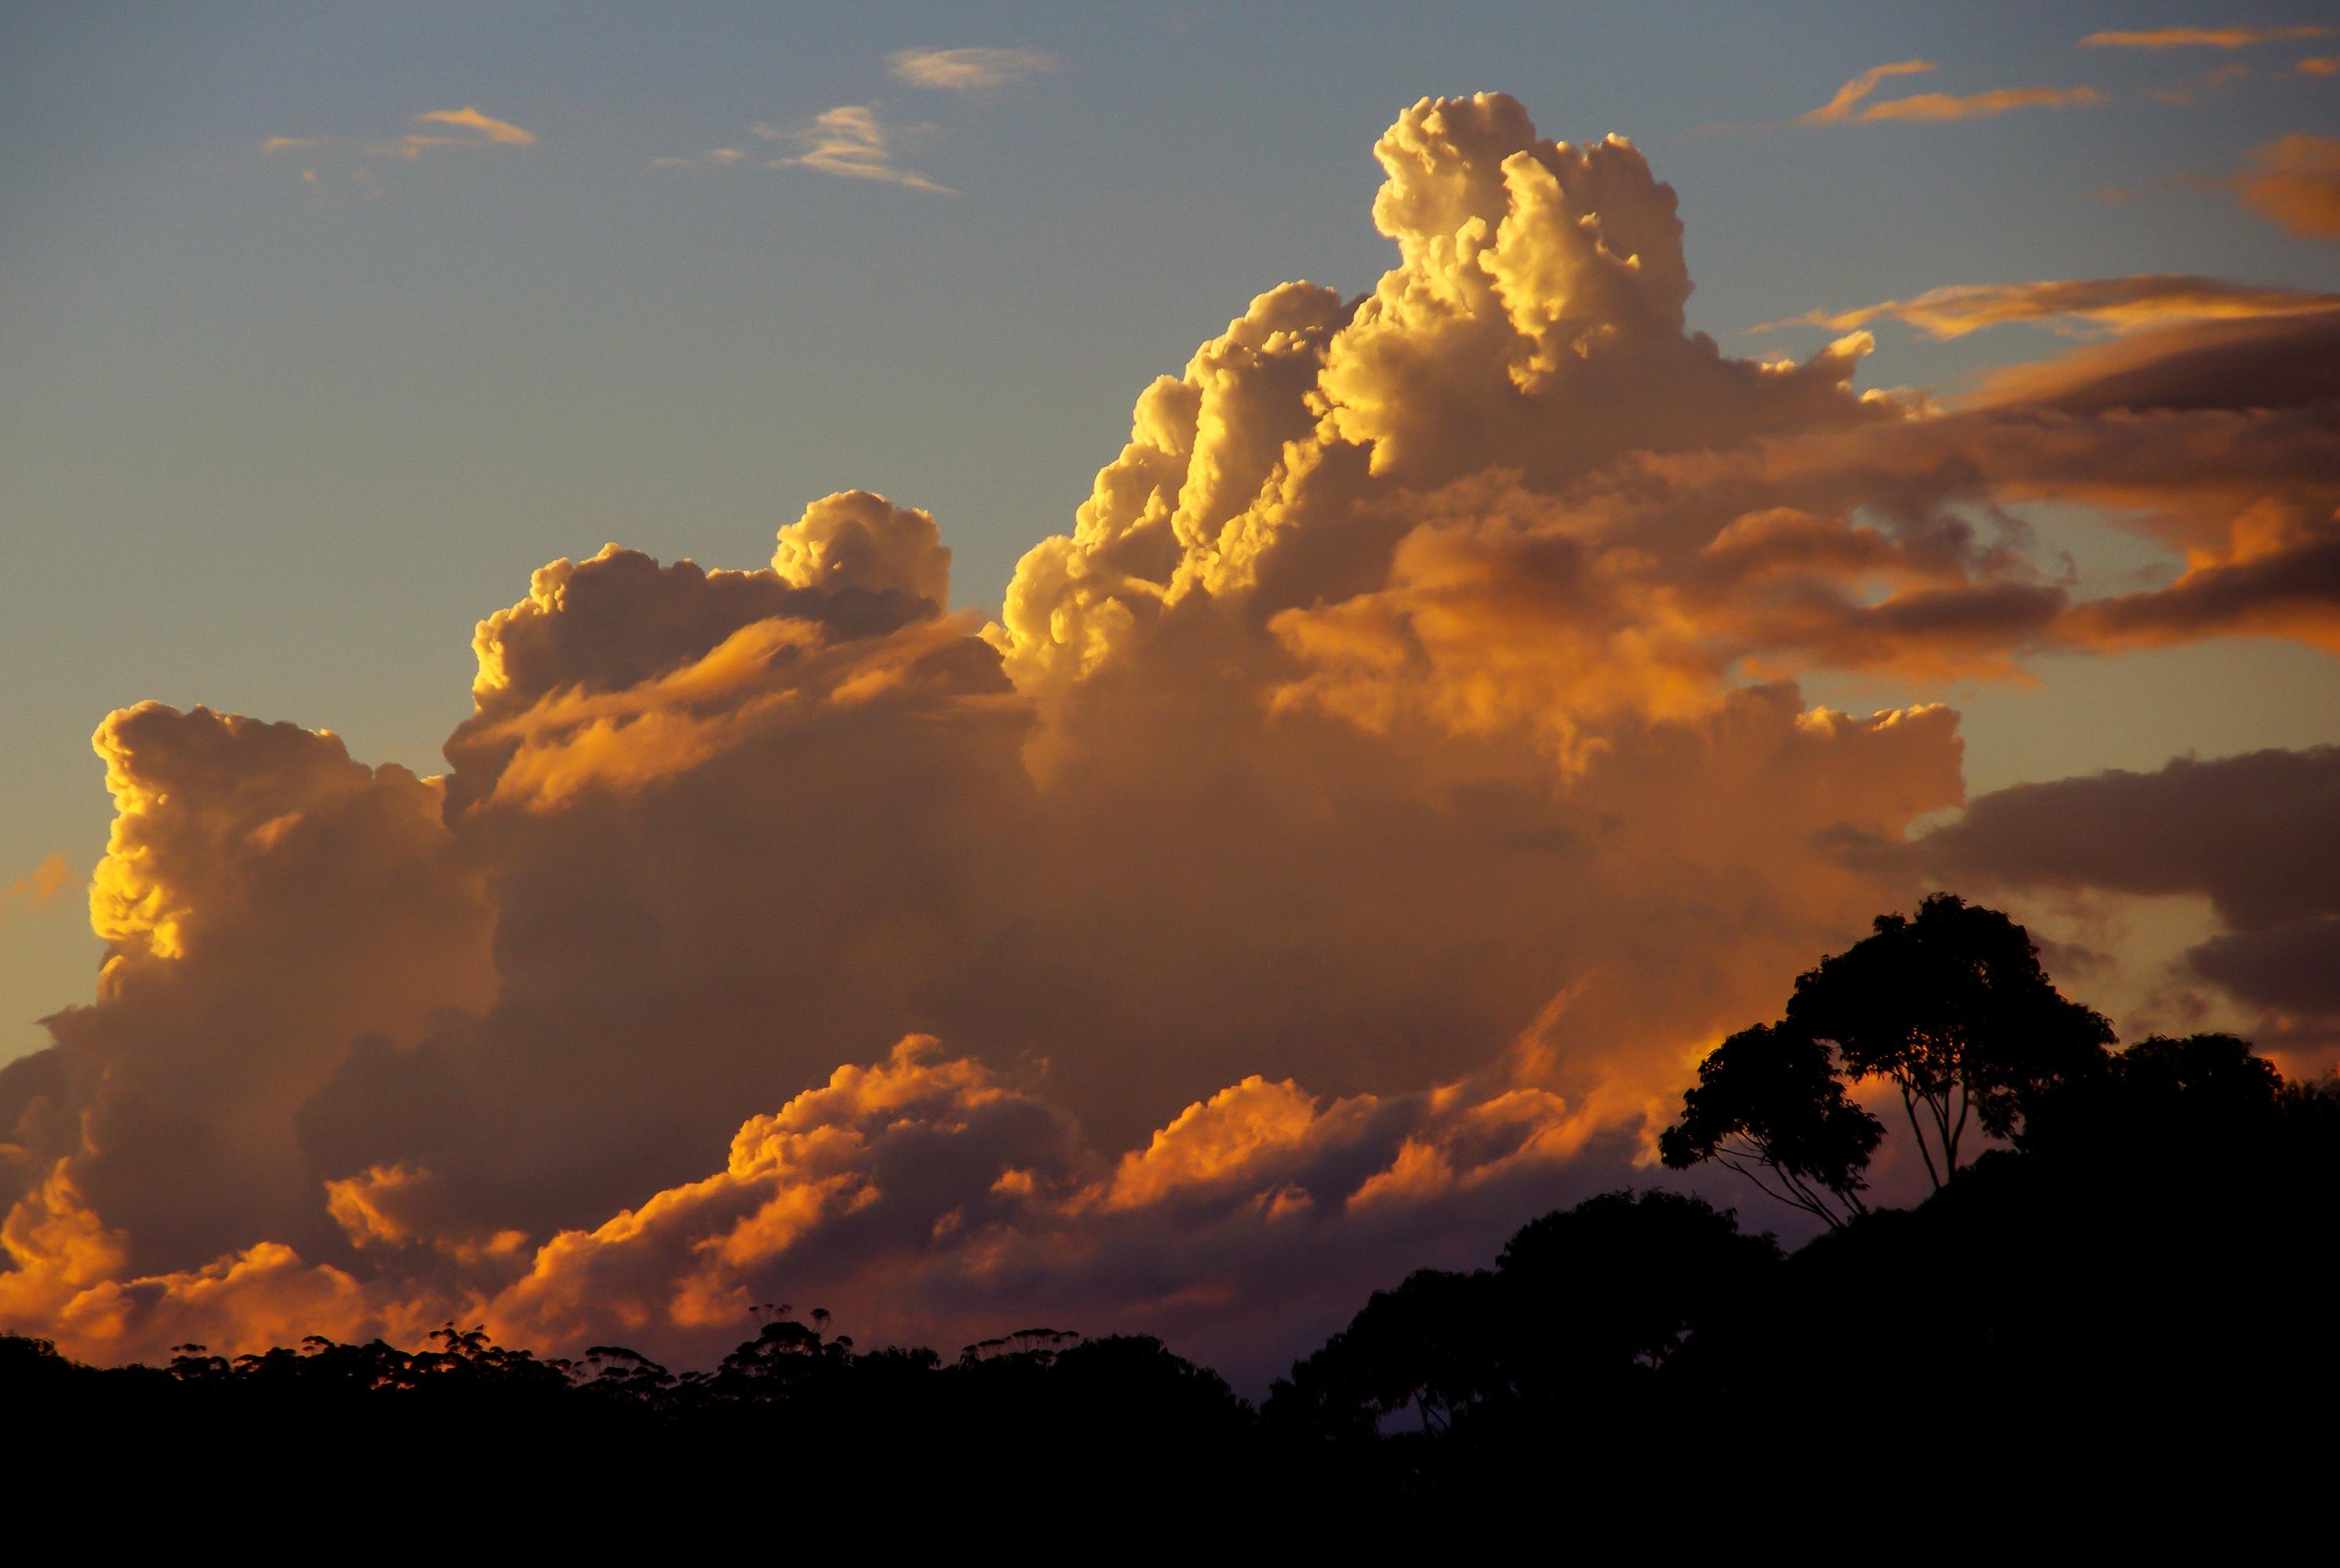 Картинки закатов и облаков